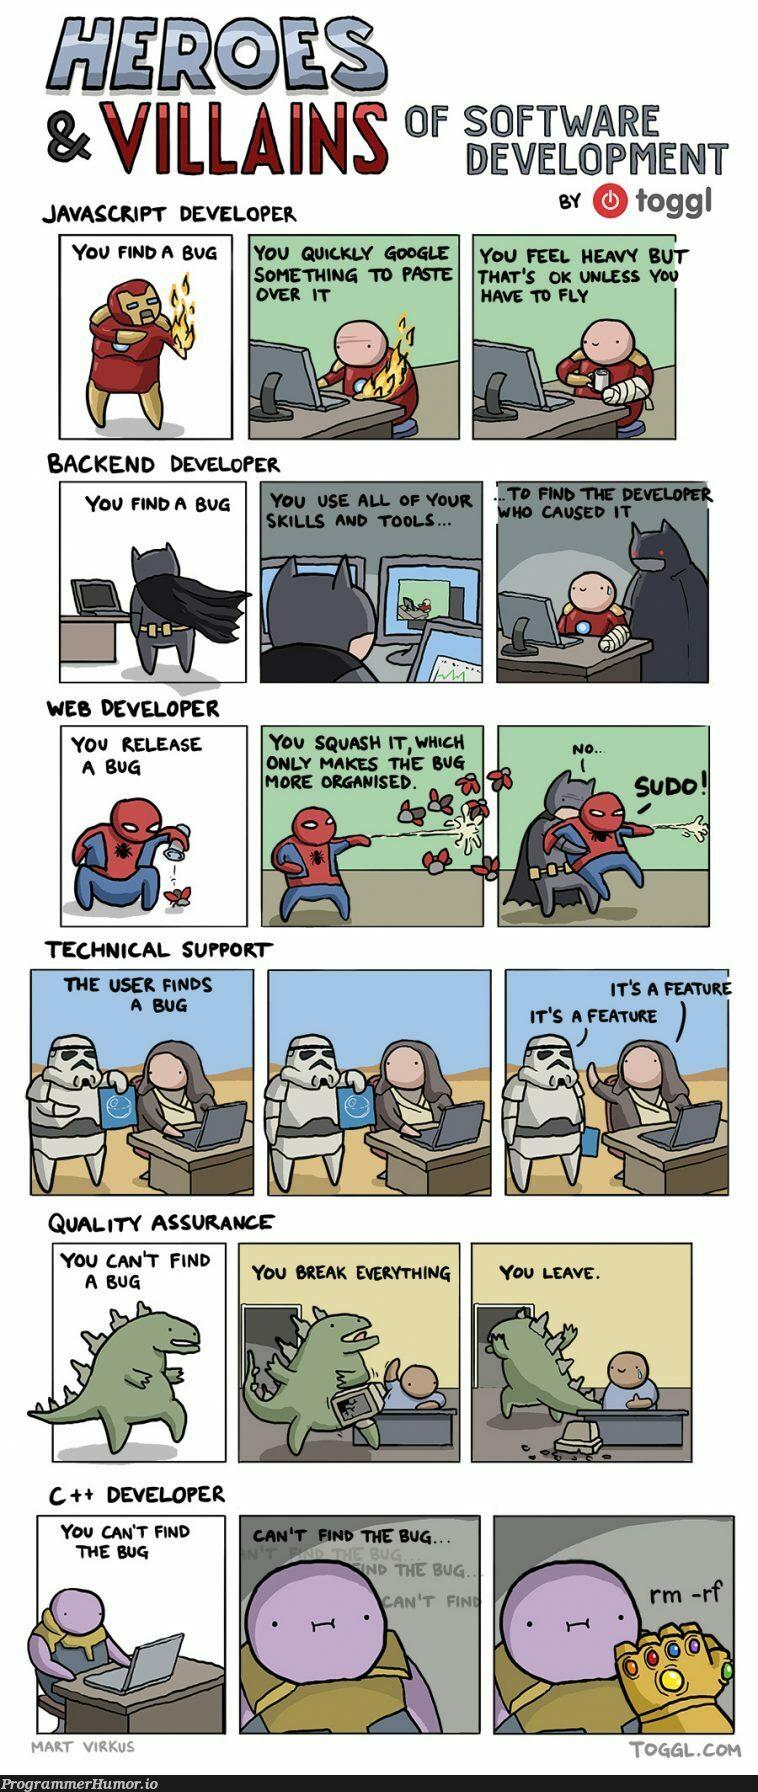 Heroes and villains of software development | developer-memes, javascript-memes, software-memes, java-memes, development-memes, javascript dev-memes, bug-memes, release-memes | ProgrammerHumor.io